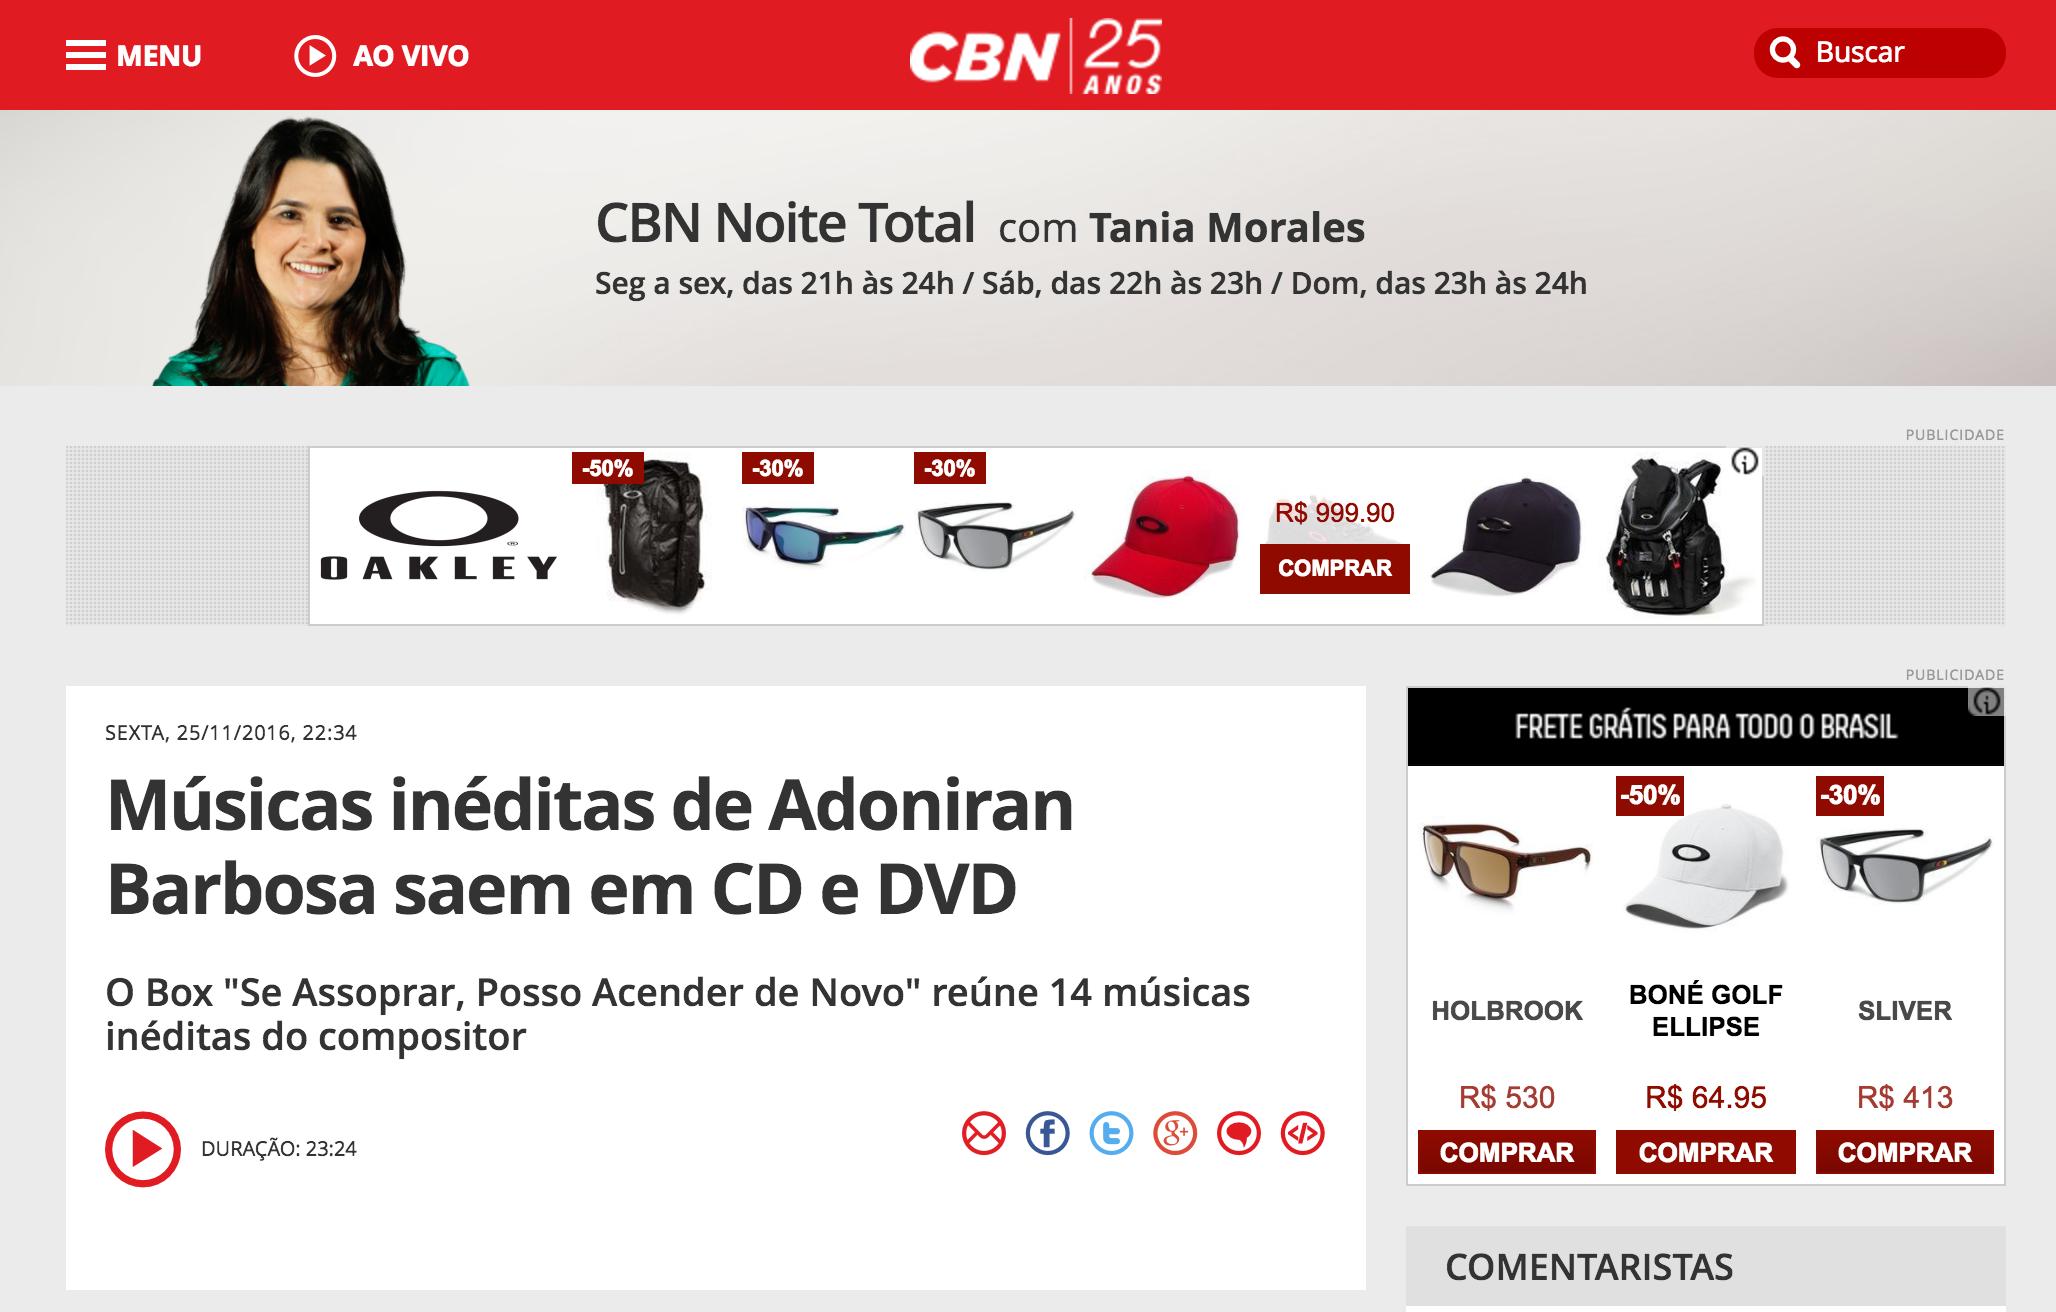 Adoniran - CBN